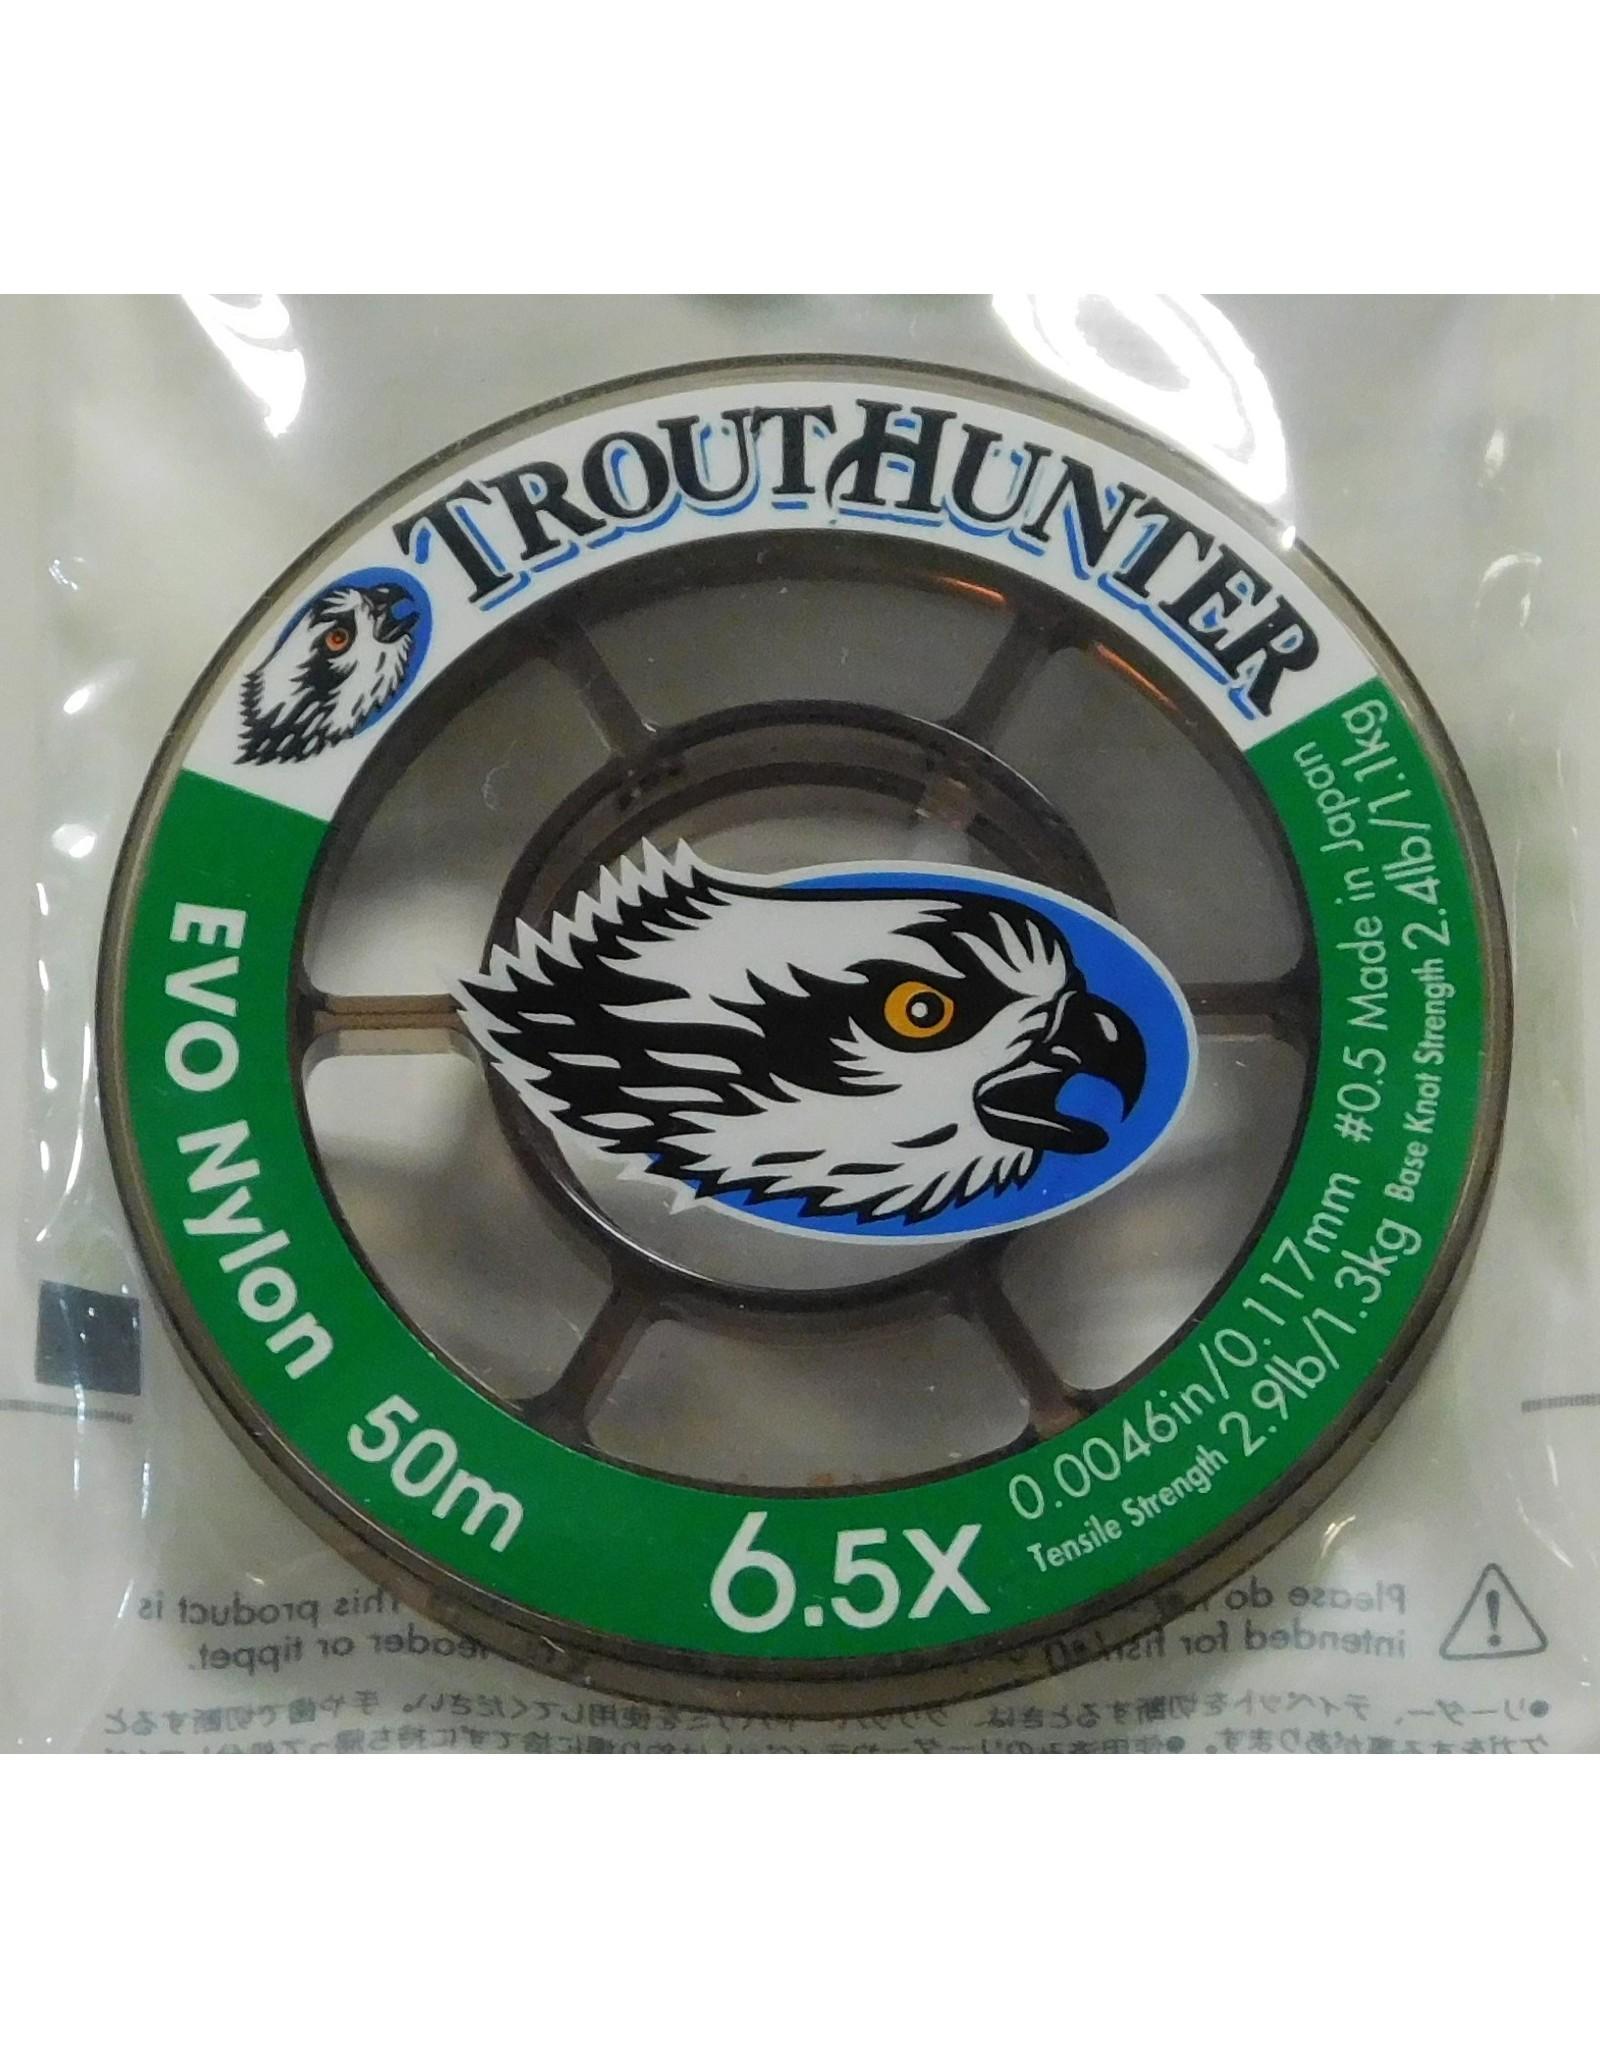 Trouthunter TroutHunter EVO Nylon Tippet 6.5X 50m